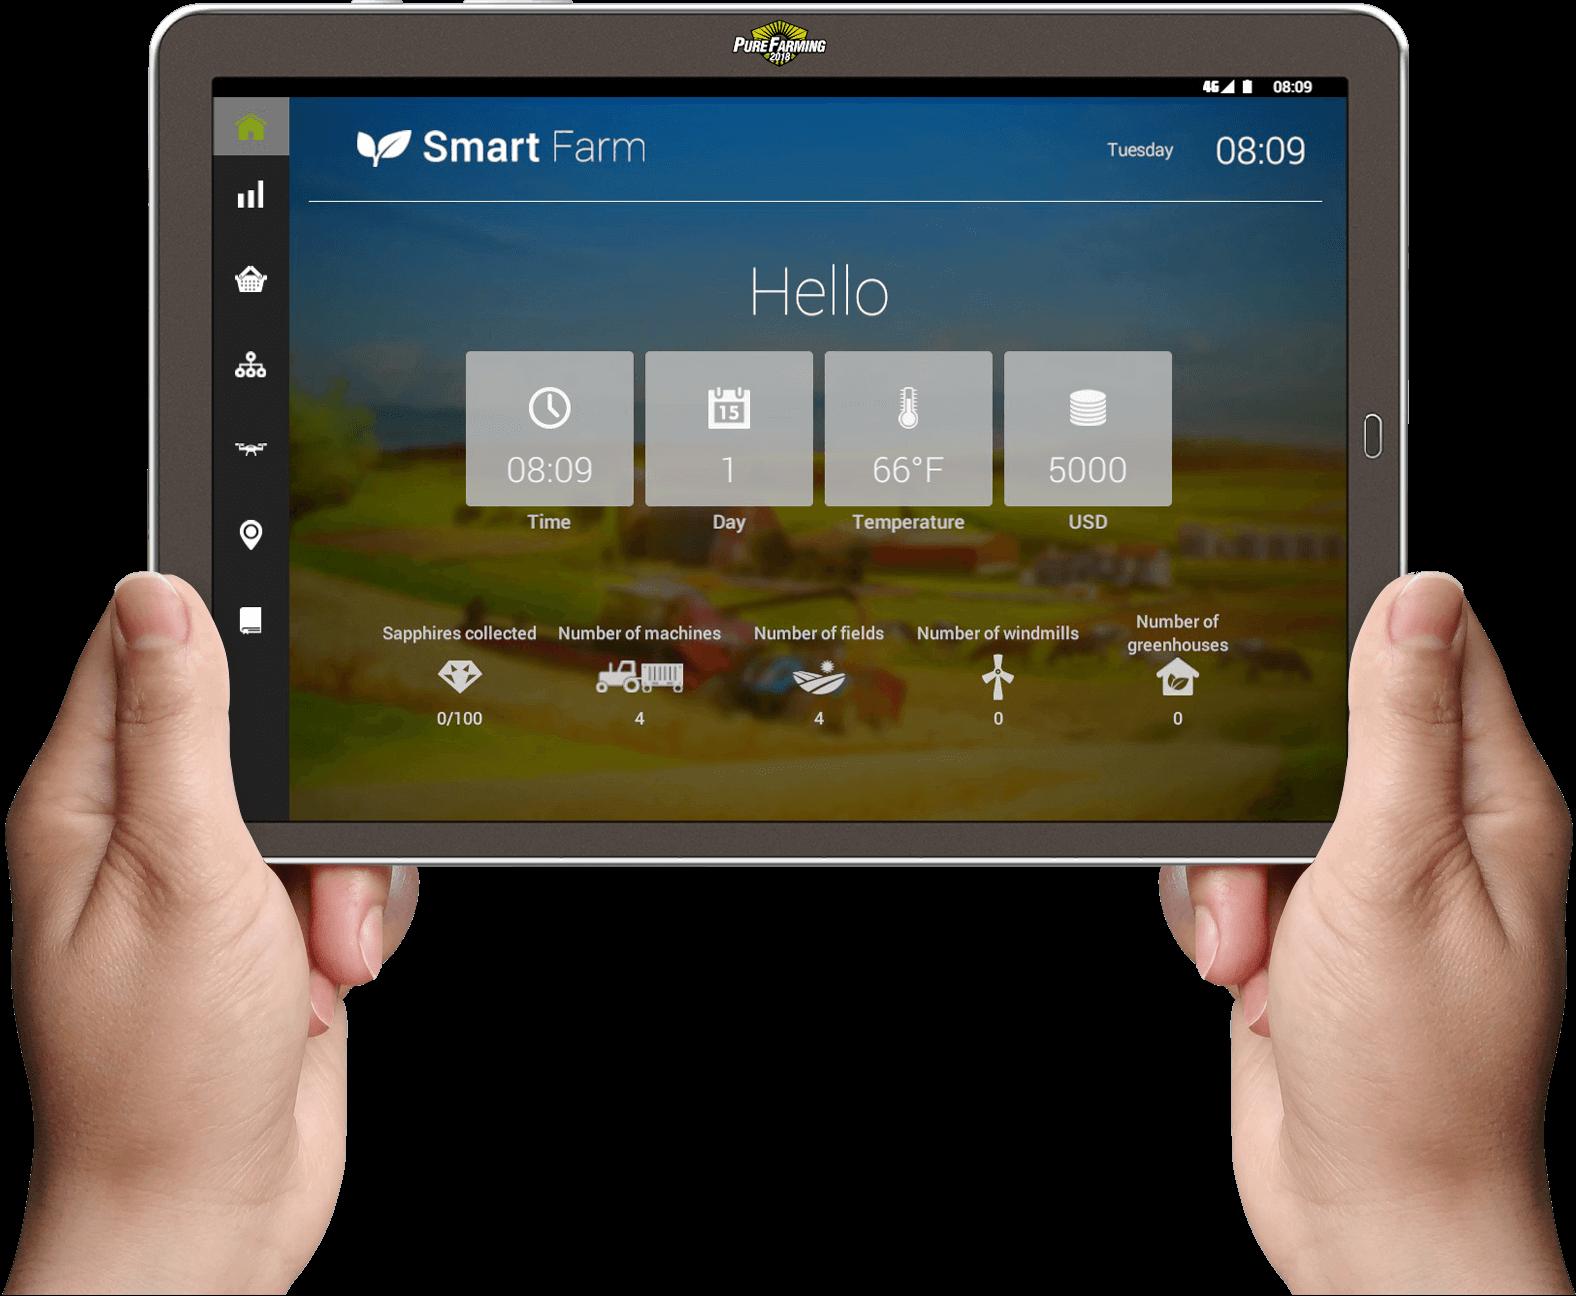 Smart Farm • Pure Farming 2018